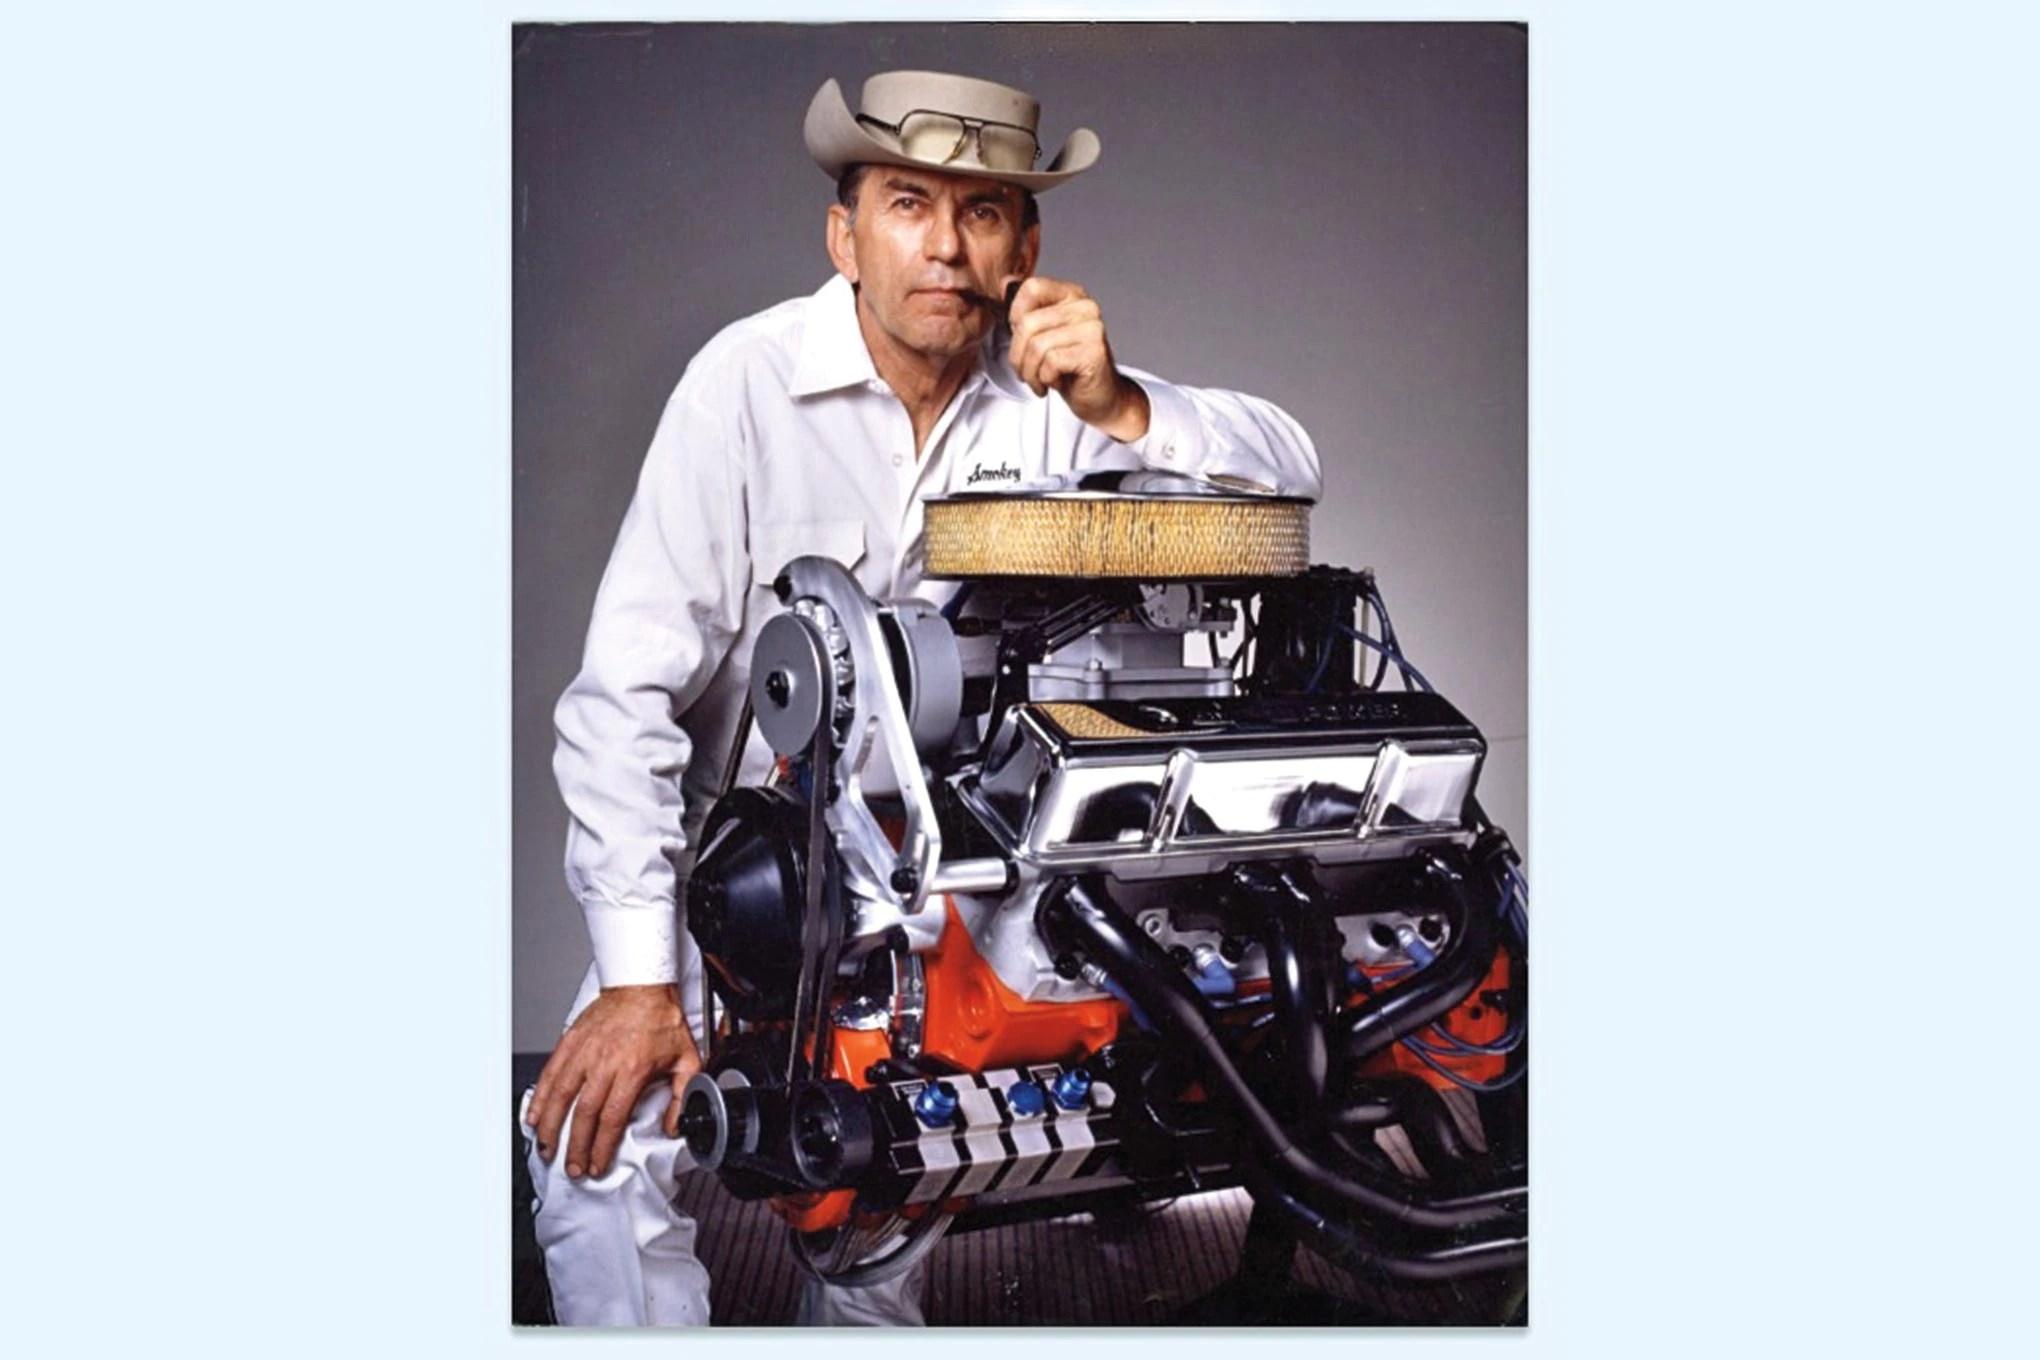 Indy Car Racing Wallpaper Smokey Yunick Amp 40 Years Of The Small Block Chevy Hot